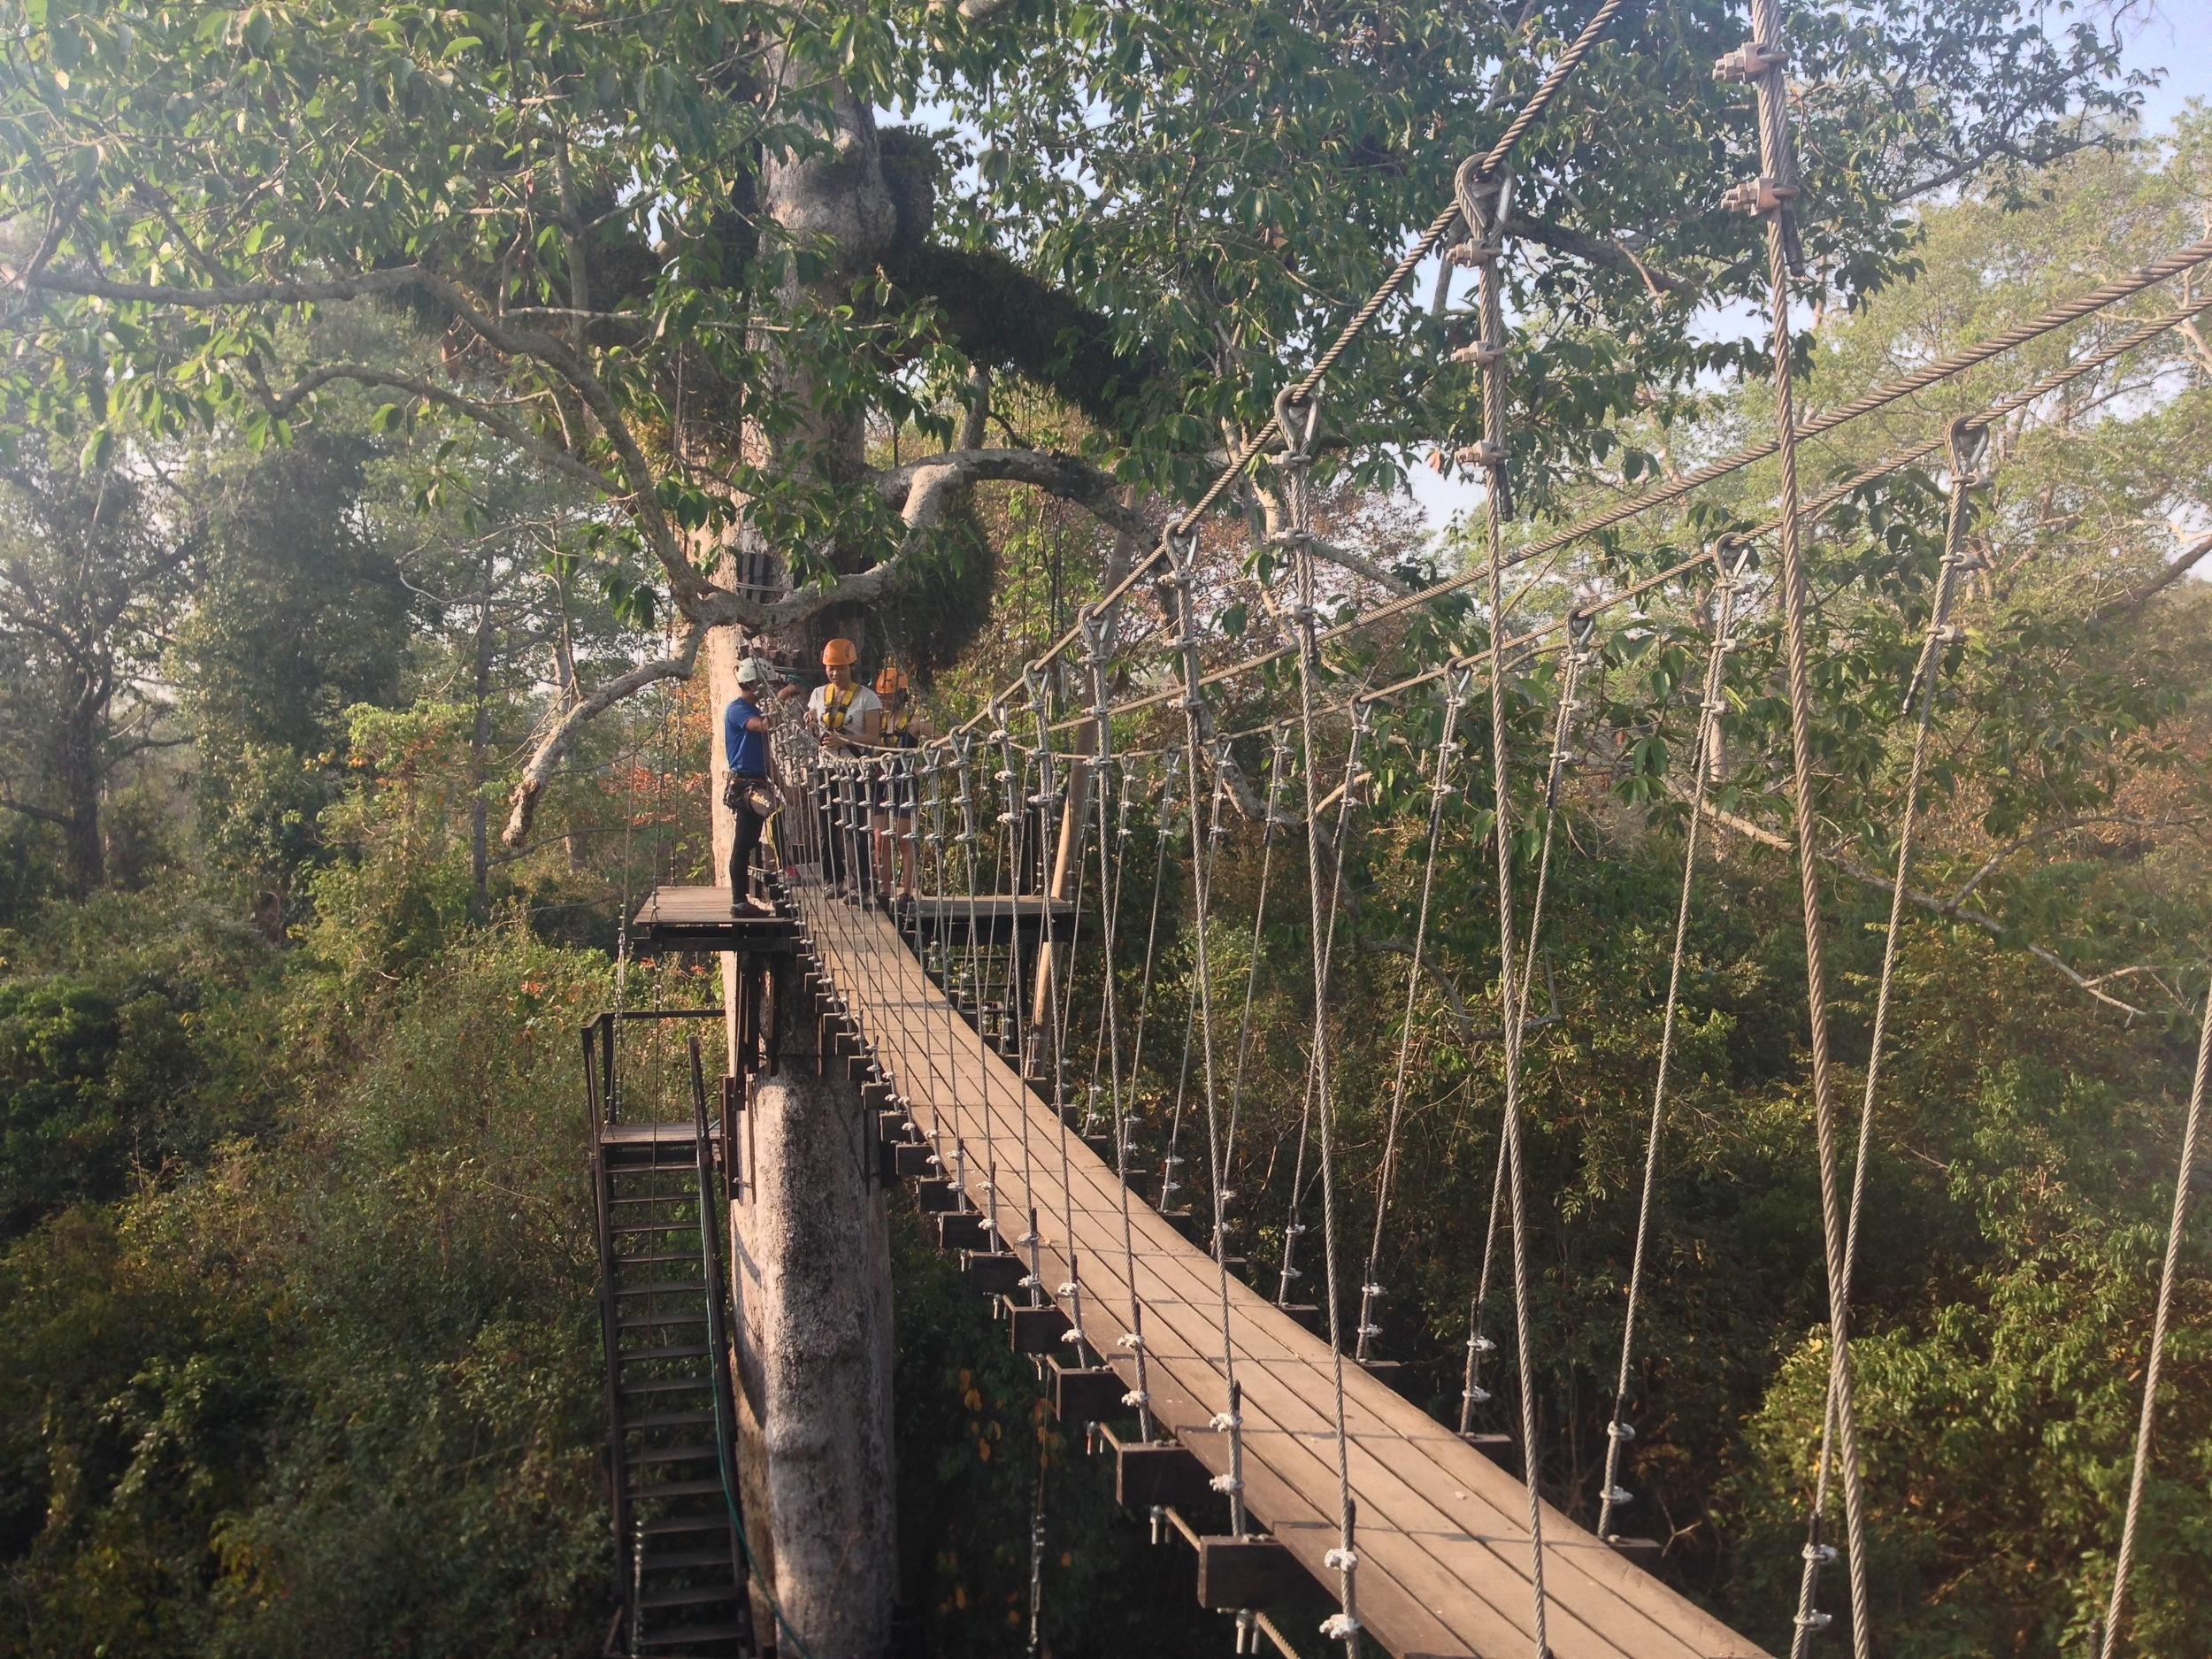 Flight of the Gibbon Zip-lining Bridge